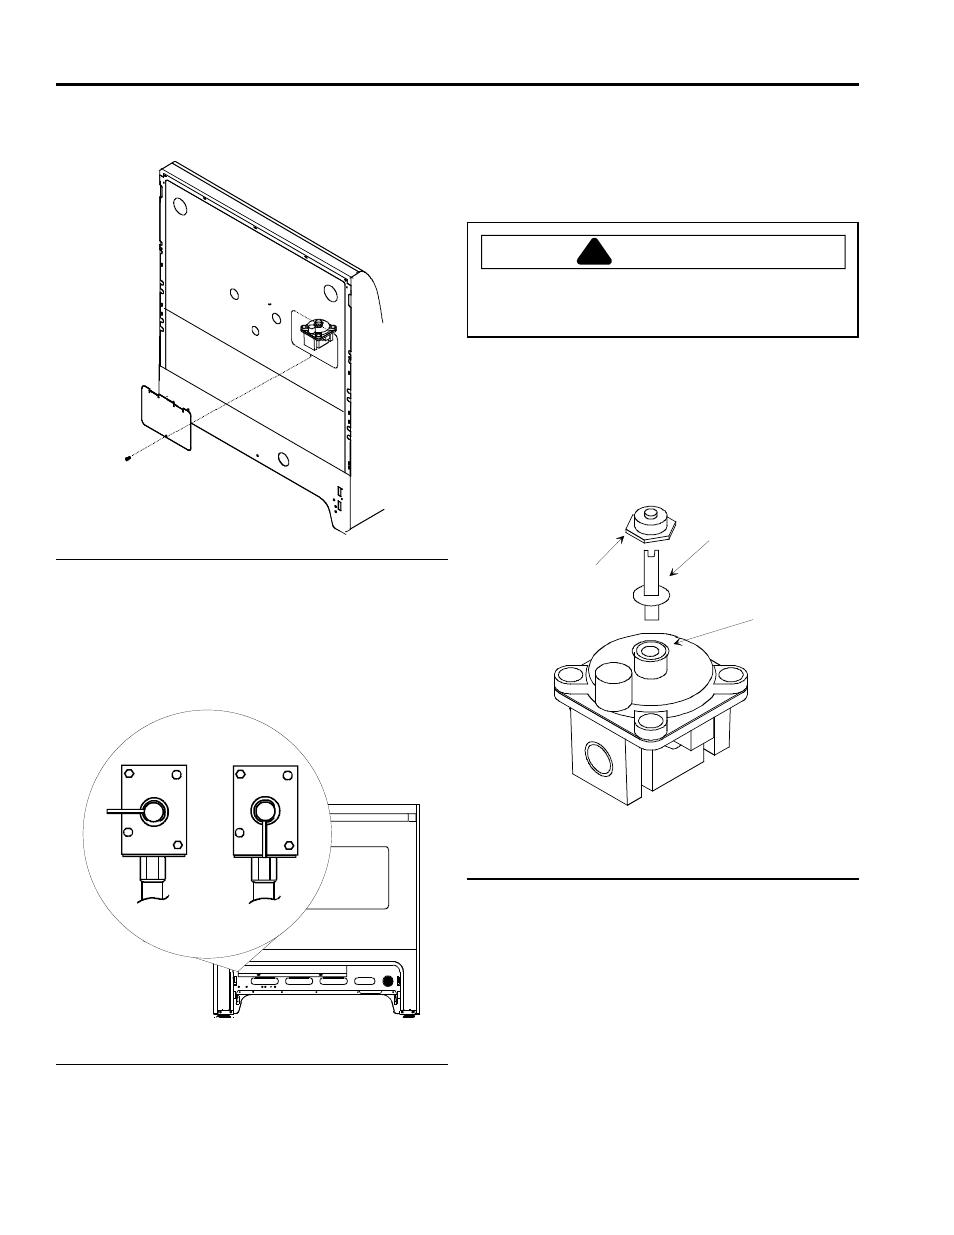 hight resolution of warning pressure regulator location oven shutoff valve amana arg7302 manuel d utilisation page 8 60